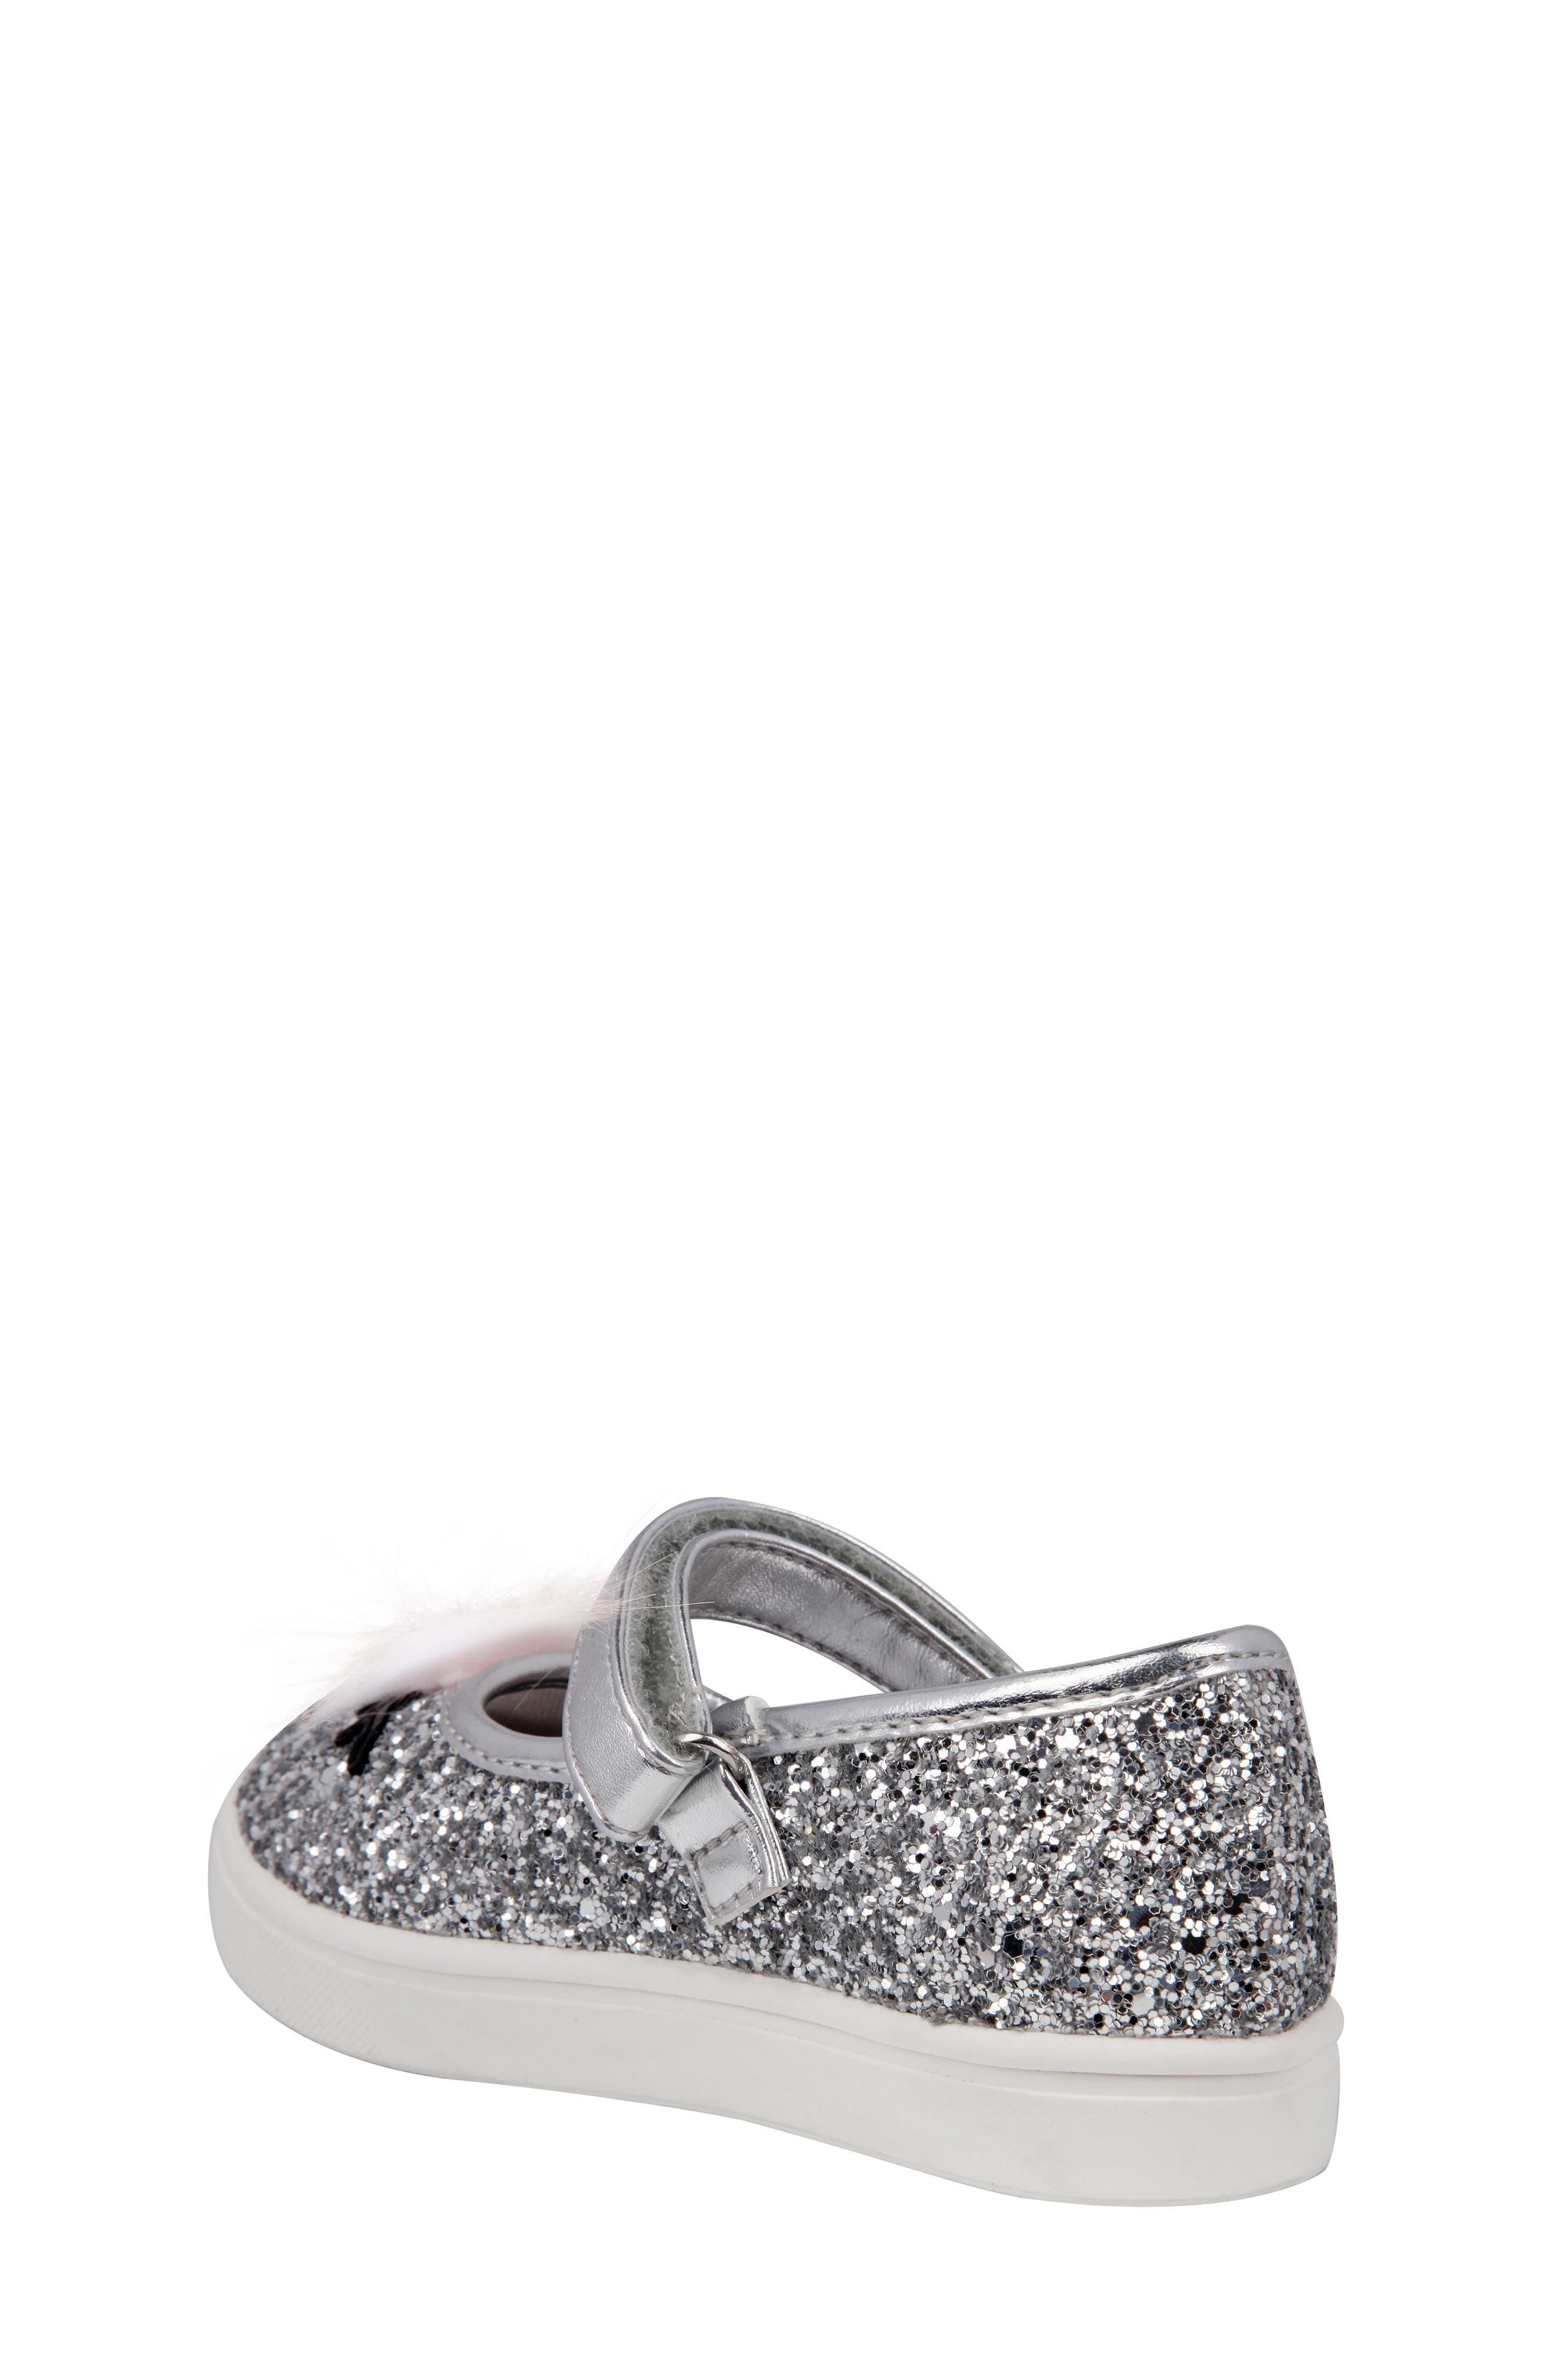 Ragina Faux Fur Glitter Mary Jane Sneaker,                             Alternate thumbnail 2, color,                             Silver Chunky Glitter